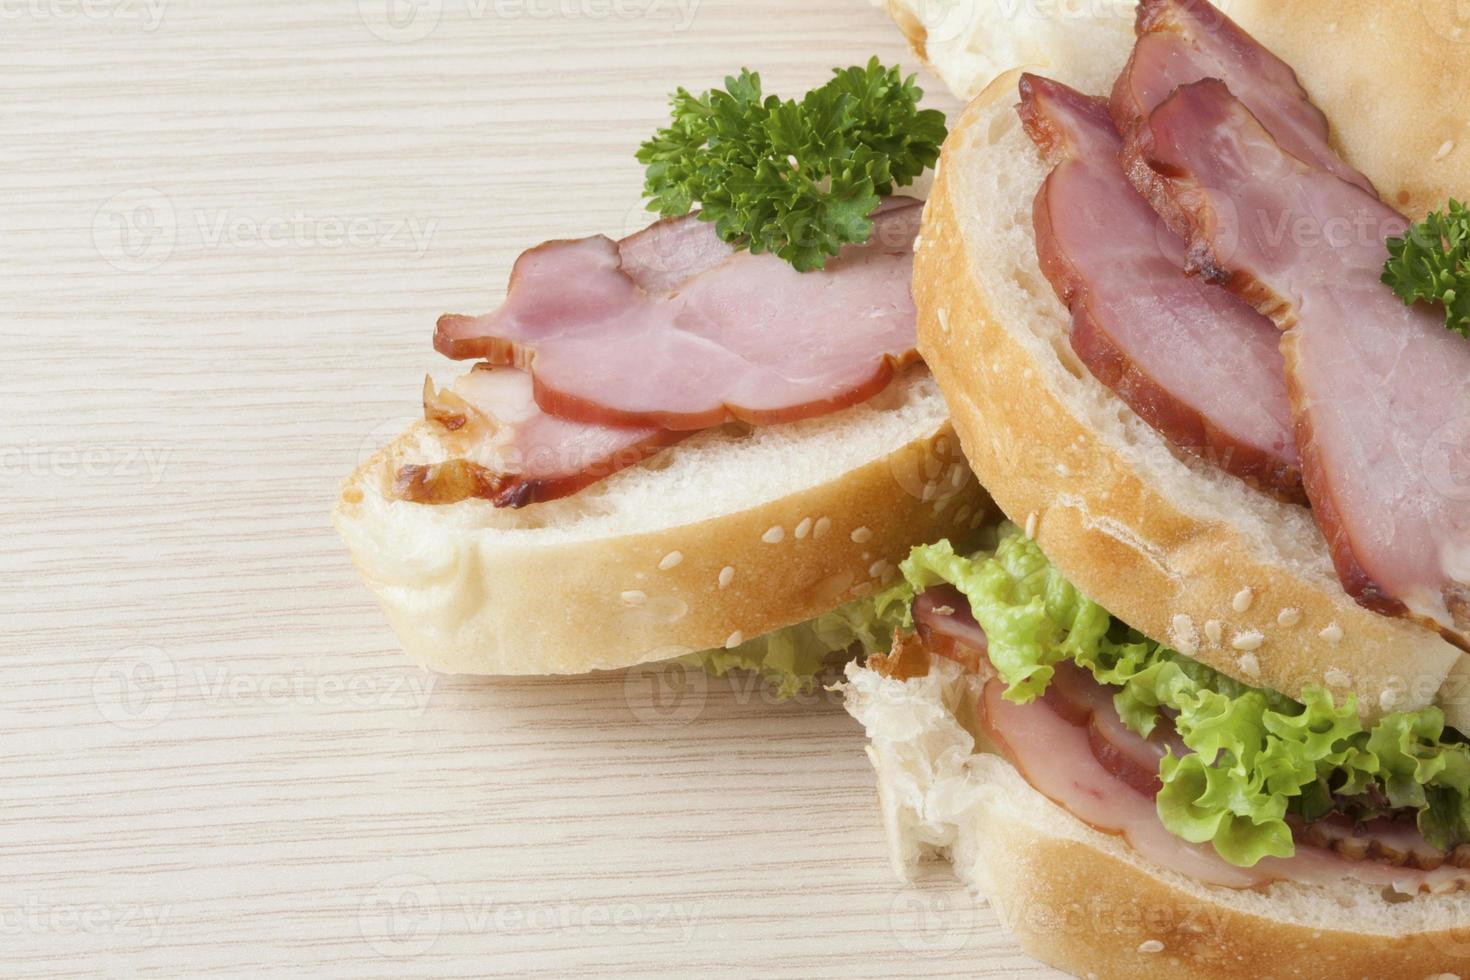 deliciosamente procurando presunto e alface sandwitch, closeup foto